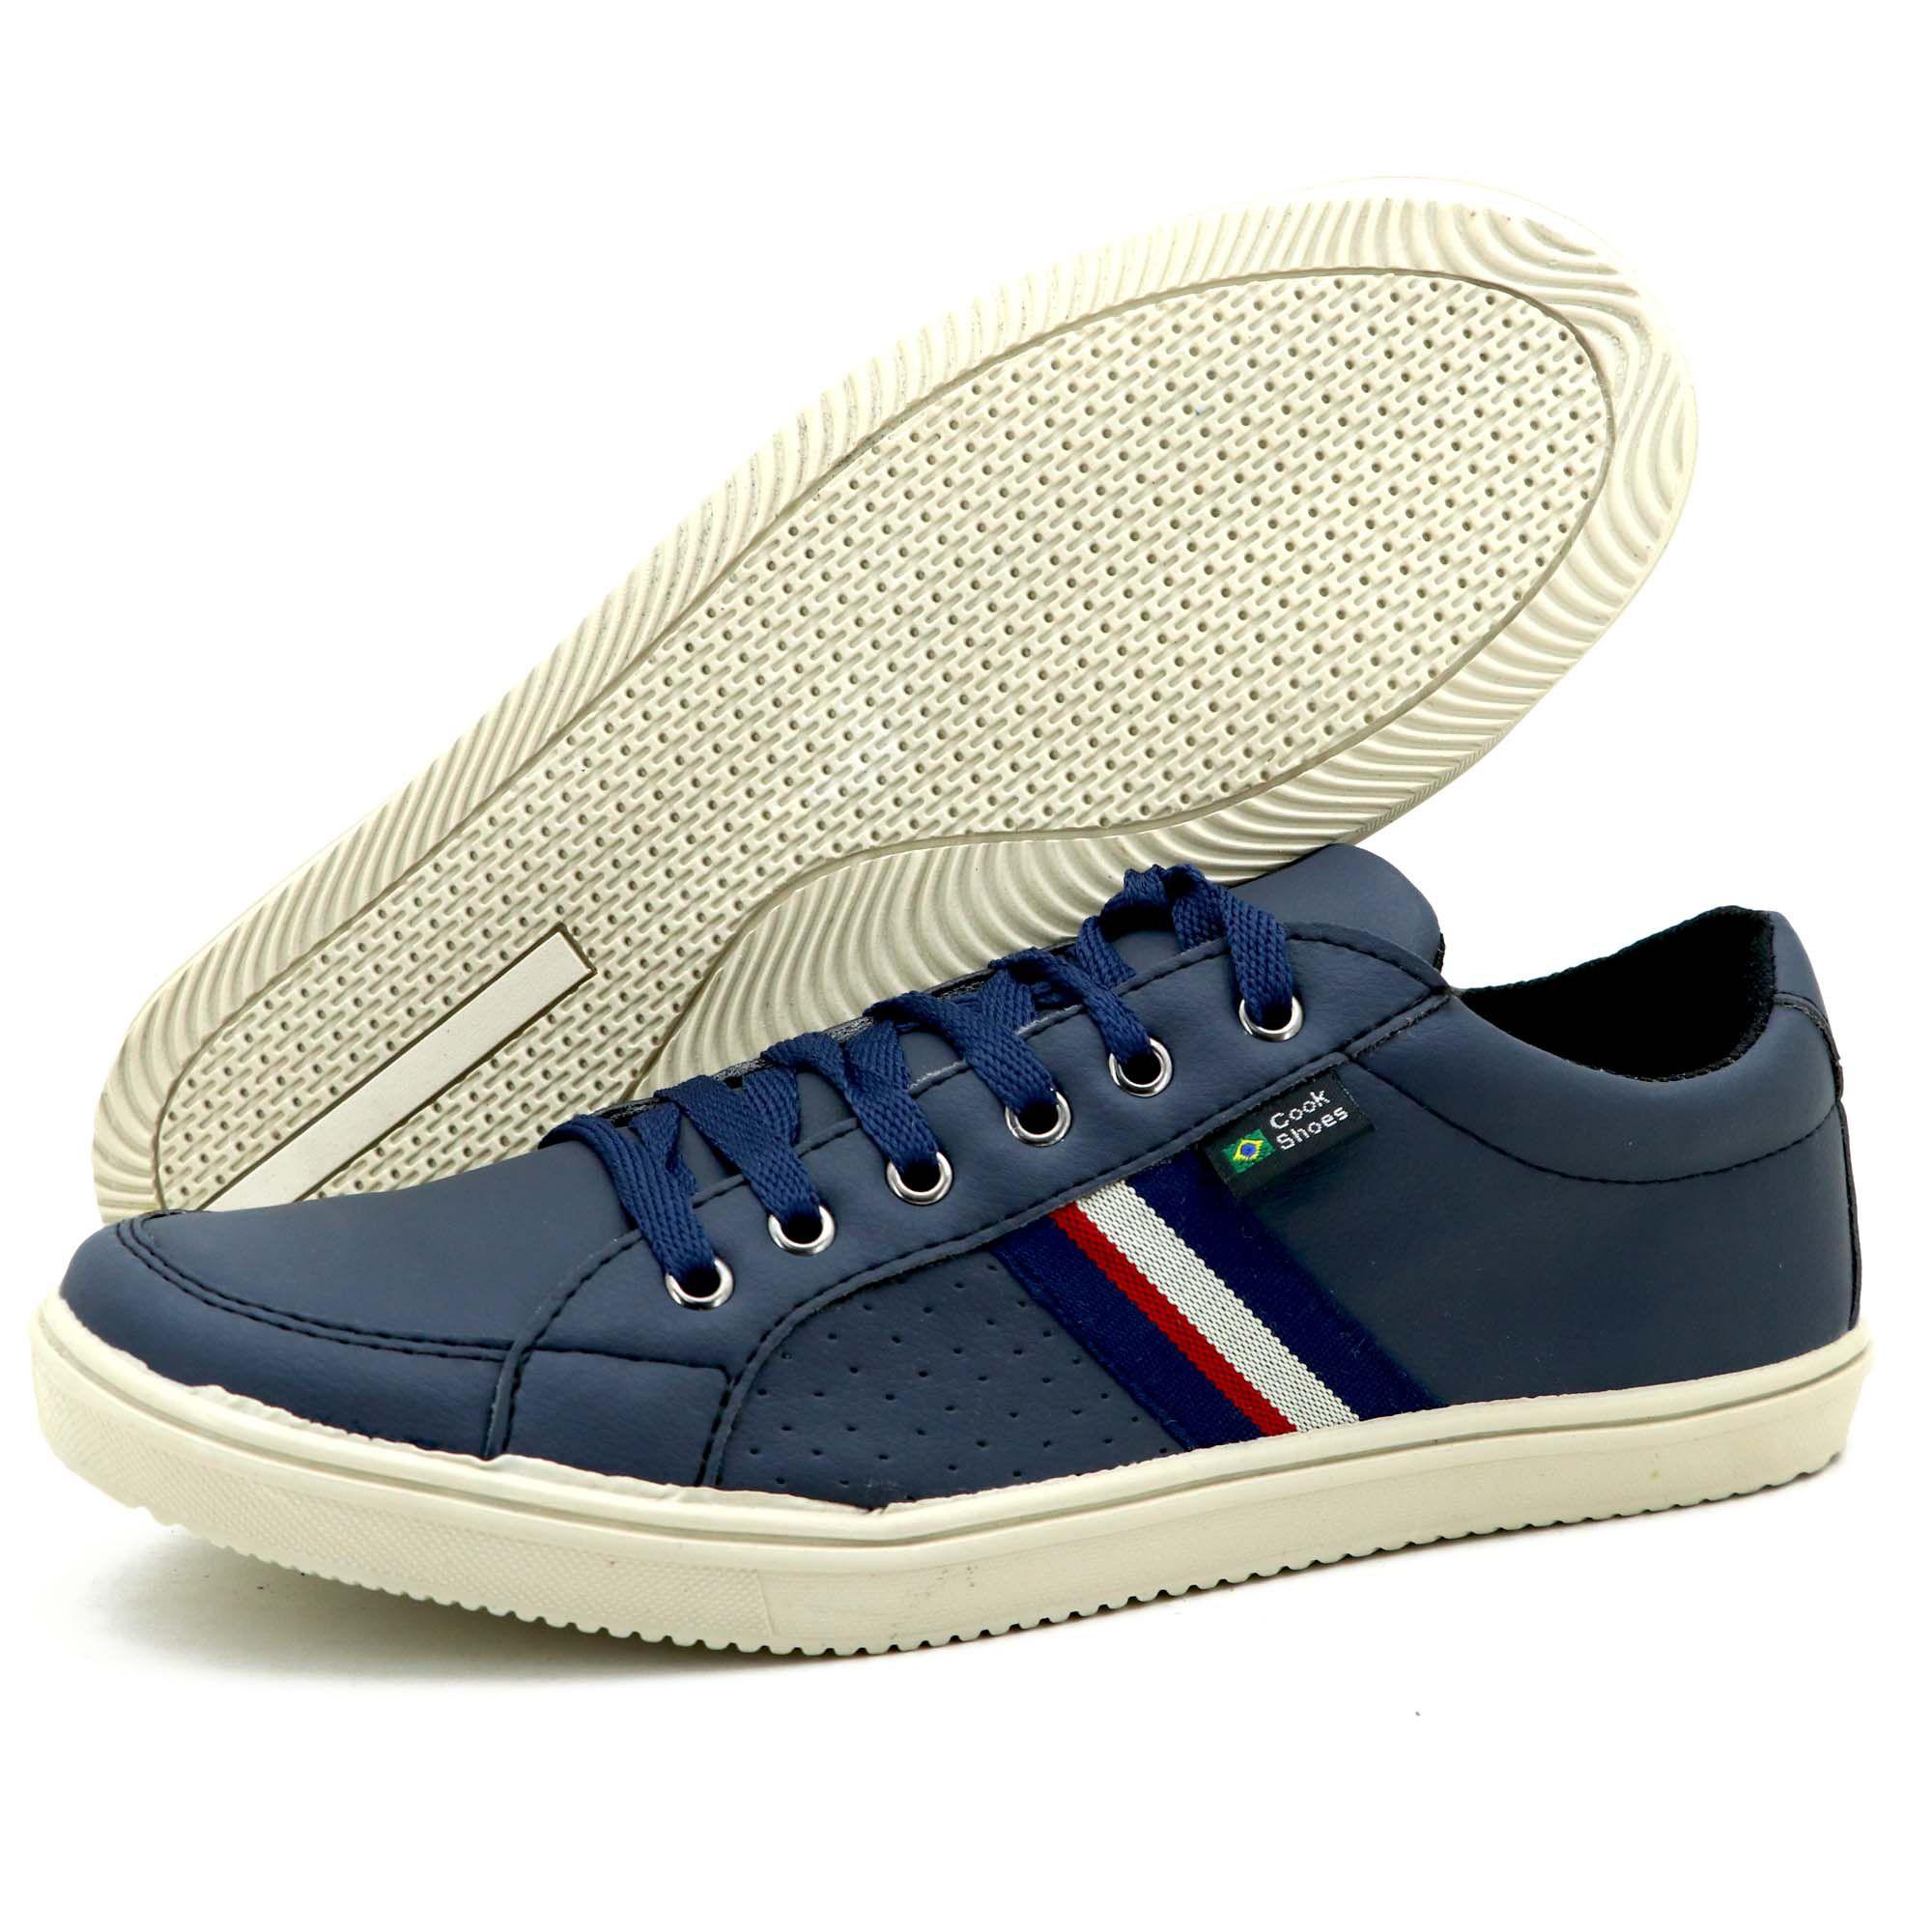 Sapatênis de couro técnologico Atron Shoes na cor azul 9001-GRÁTIS 1 CARTEIRA